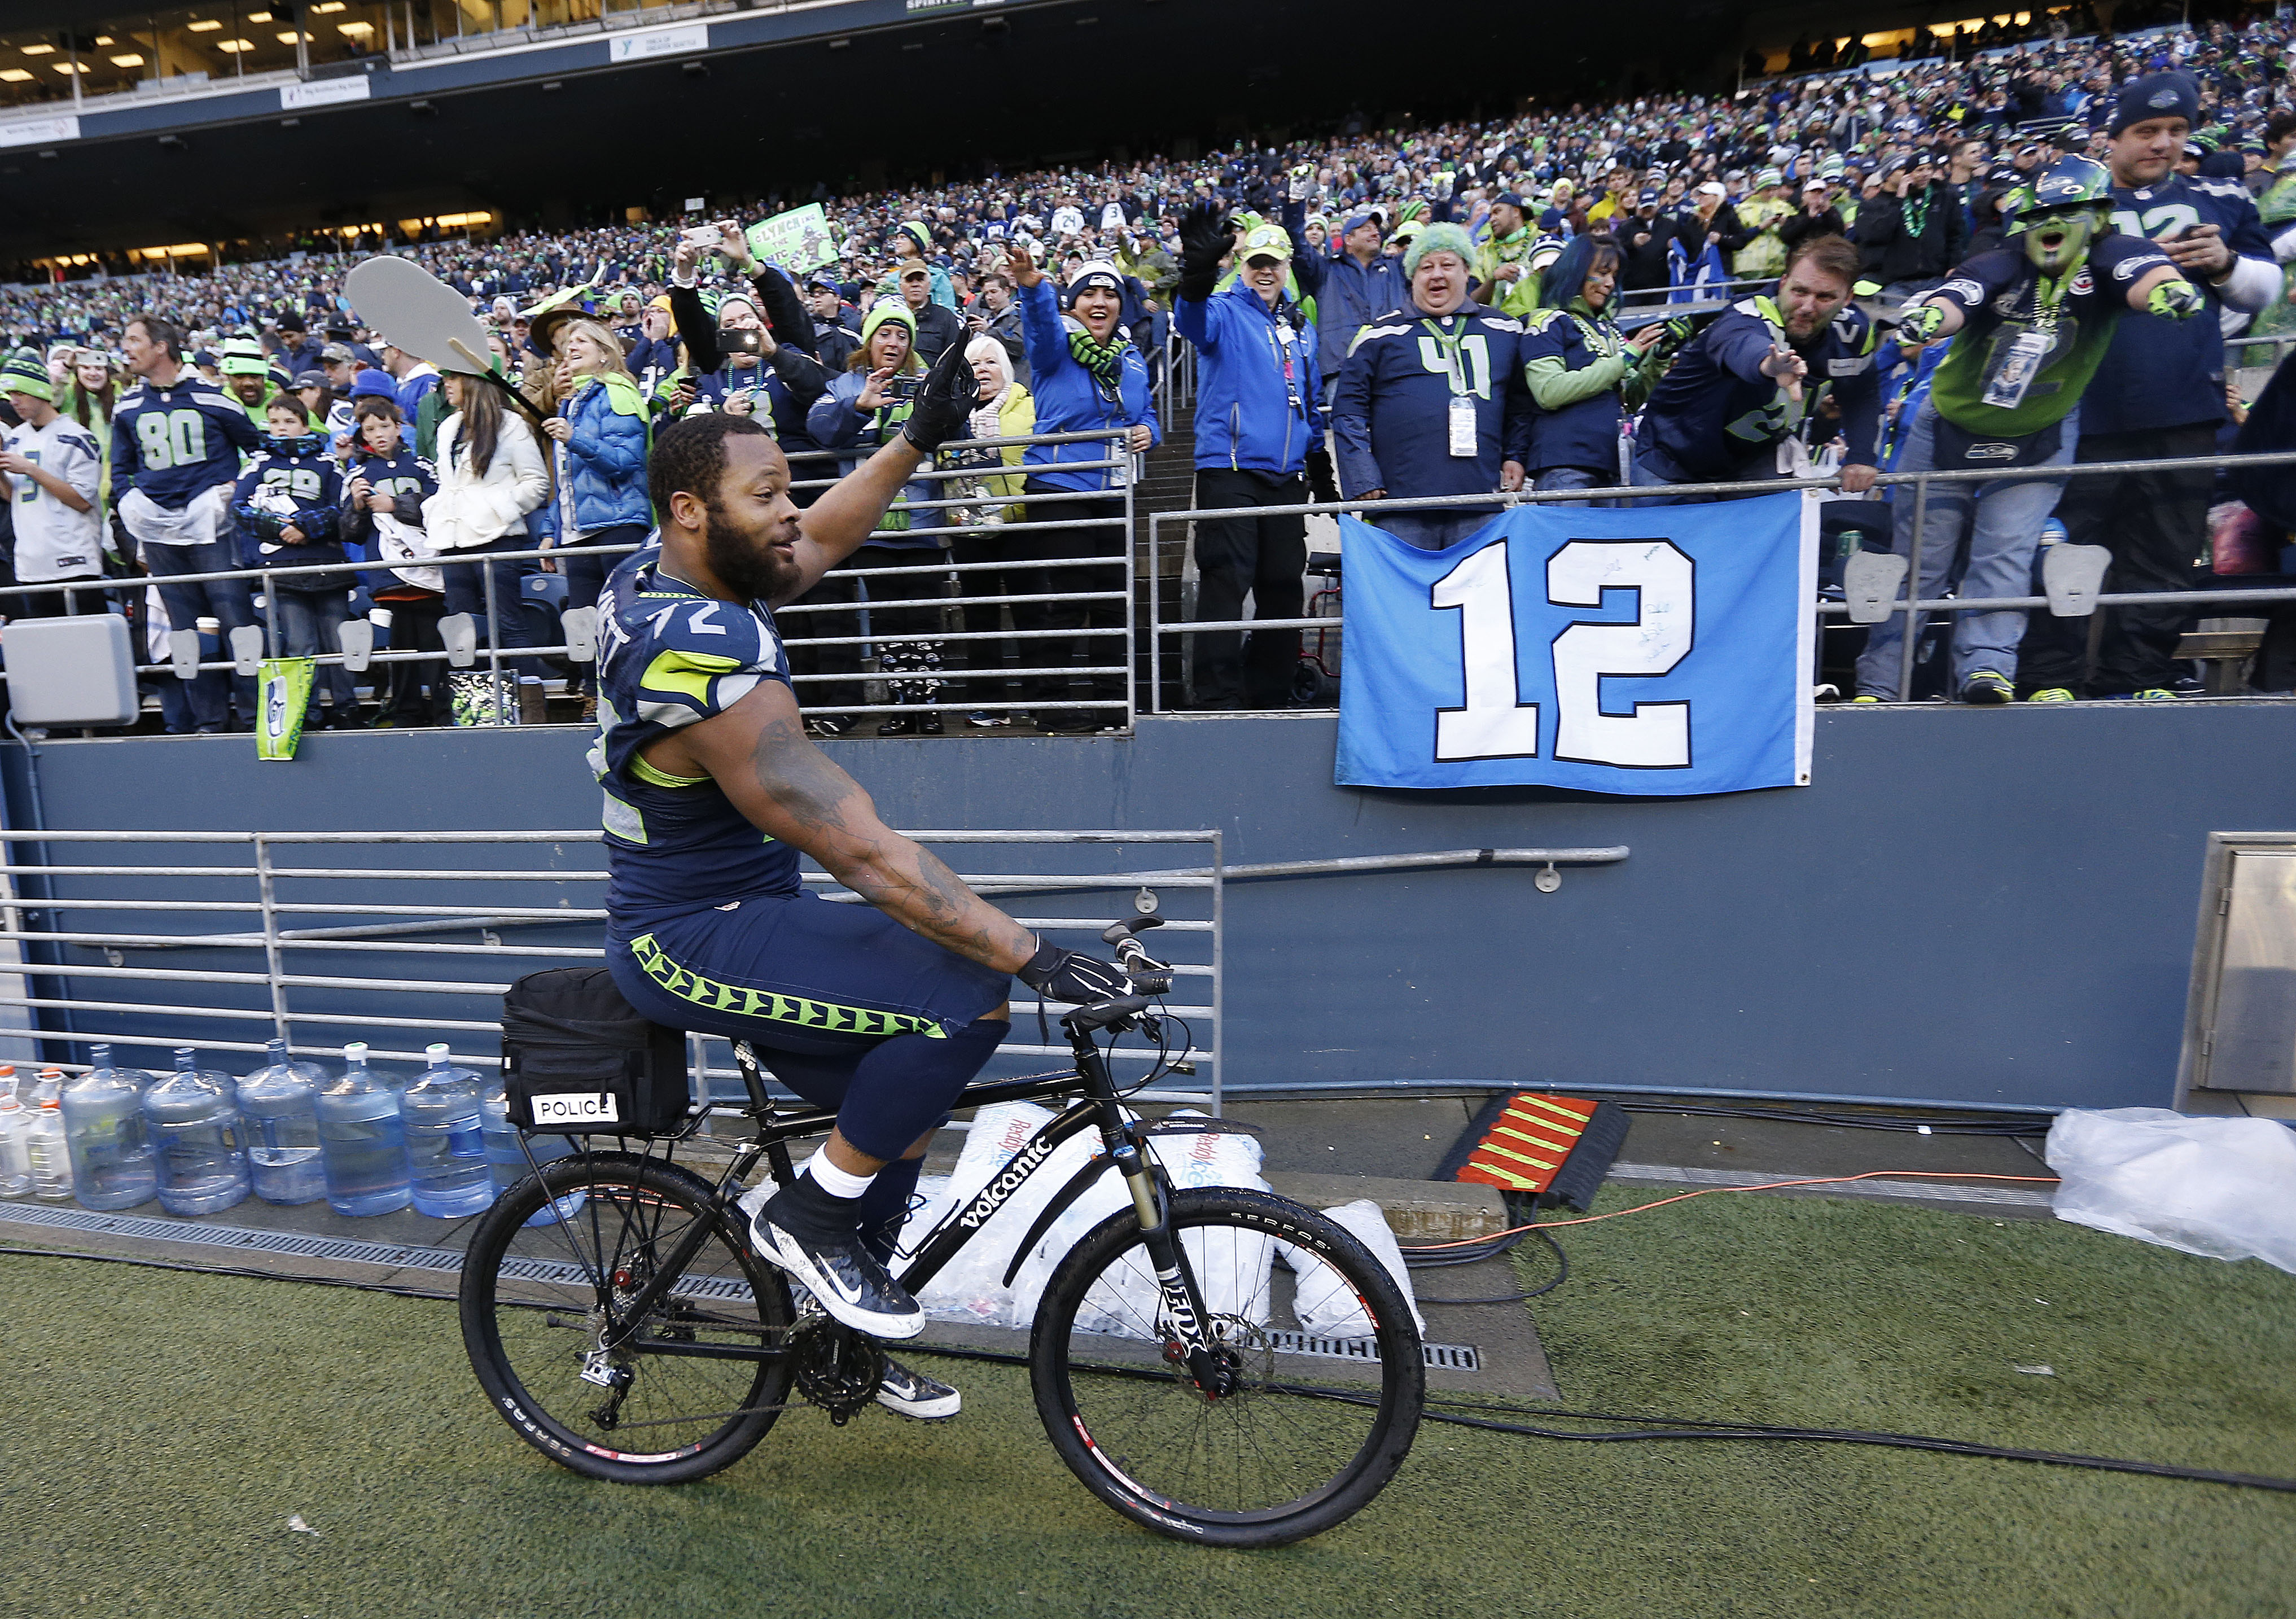 Impromptu Awkward Bike Rides: Bennett 1, Rodgers 0